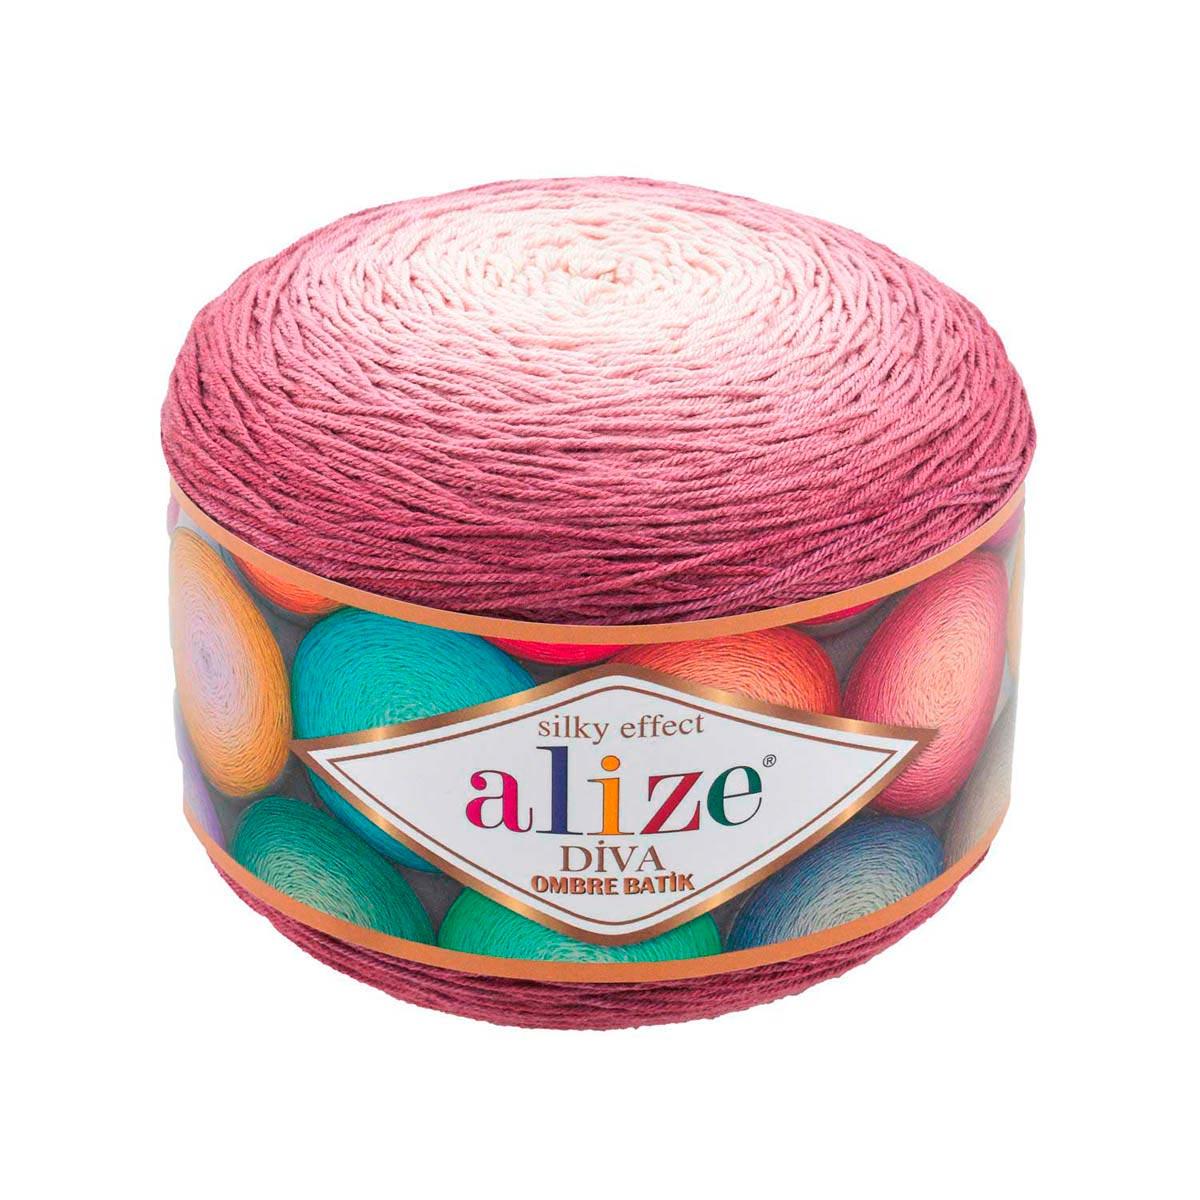 Пряжа Alize 'Diva Ombre Batik' 250г 875м (100% микрофибра акрил)